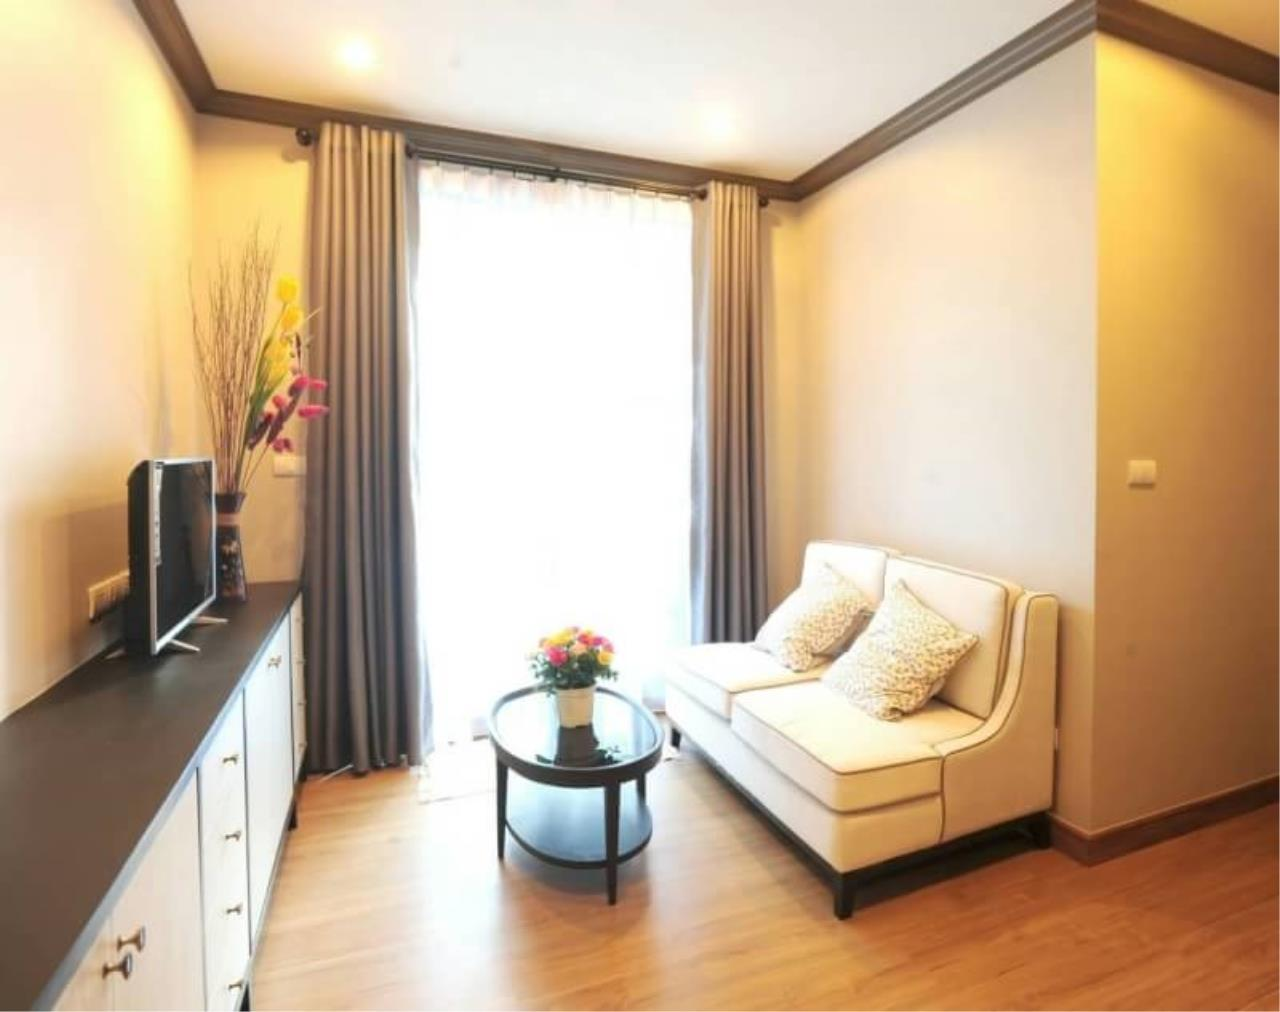 Century21 Skylux Agency's The Reserve – Kasemsan 3 / Condo For Sale / 1 Bedroom / 40 SQM / BTS National Stadium / Bangkok 2